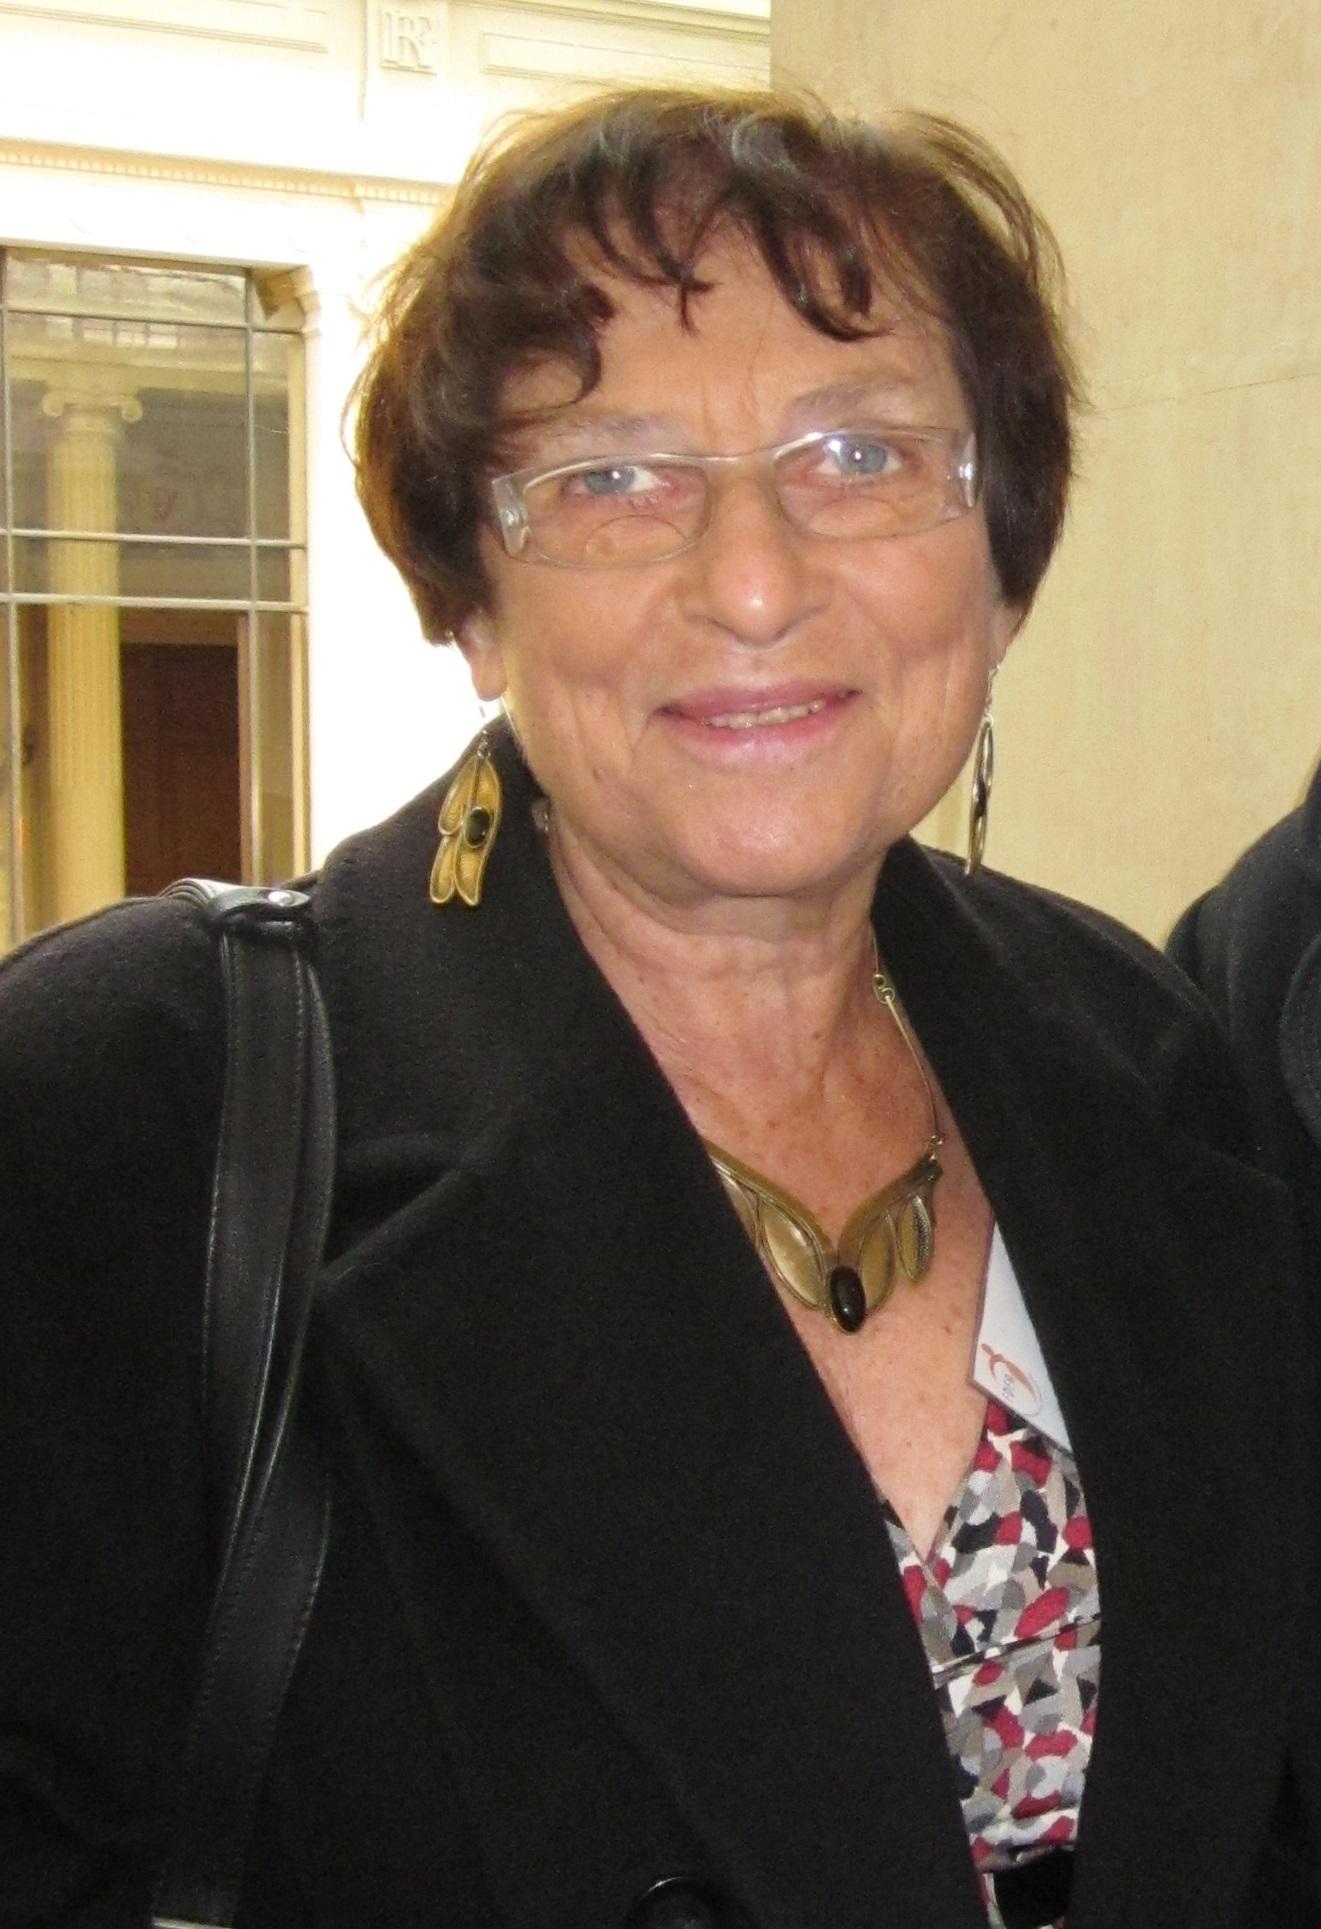 Maudy Piot